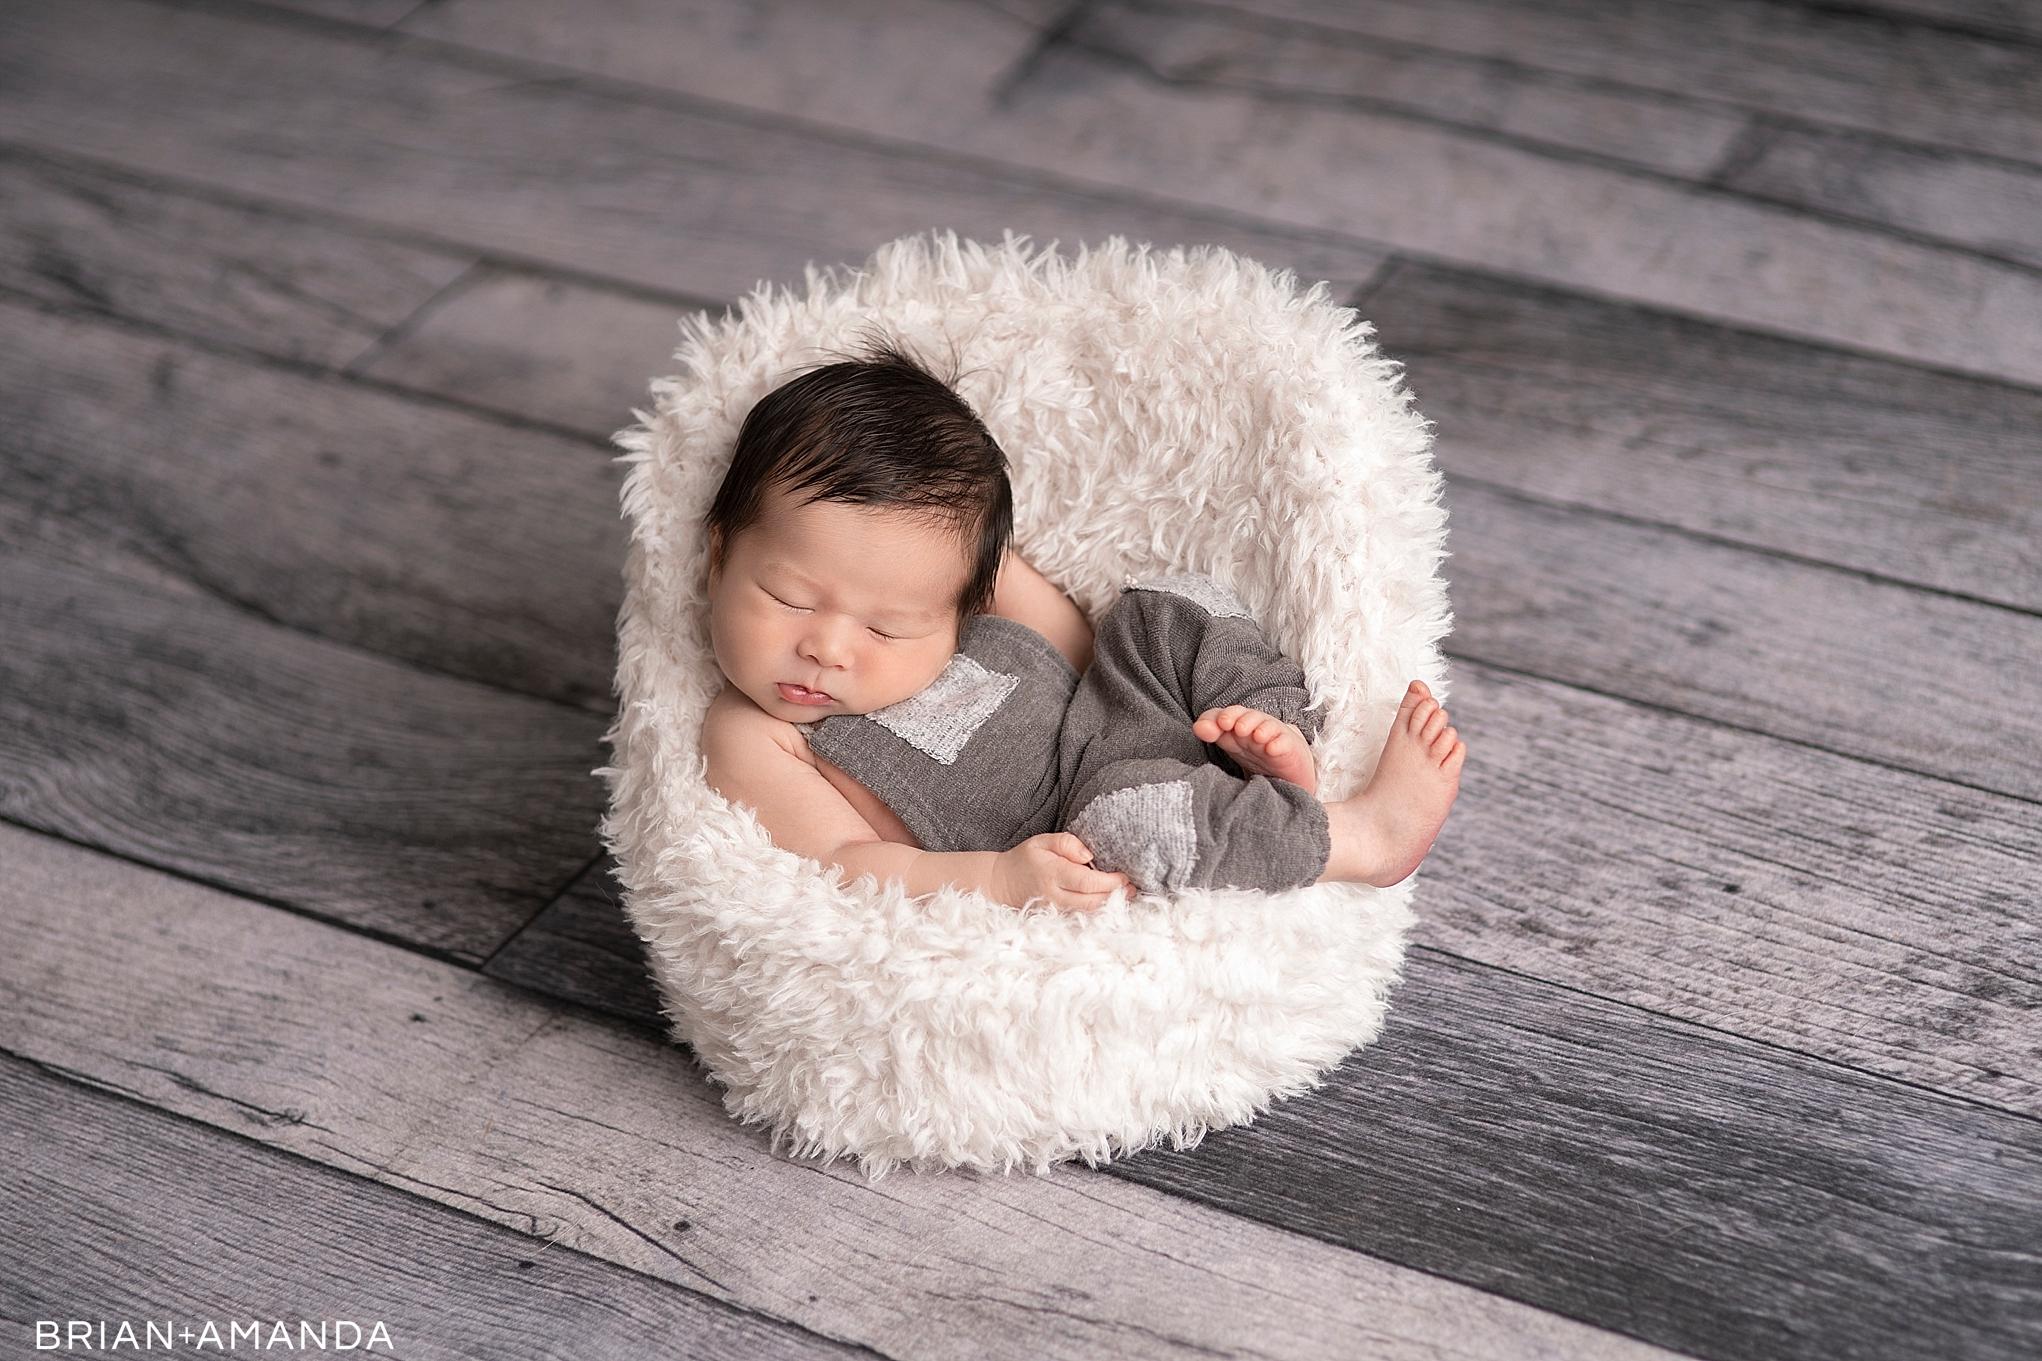 Brian plus amanda austin georgetown newborn maternity photographers